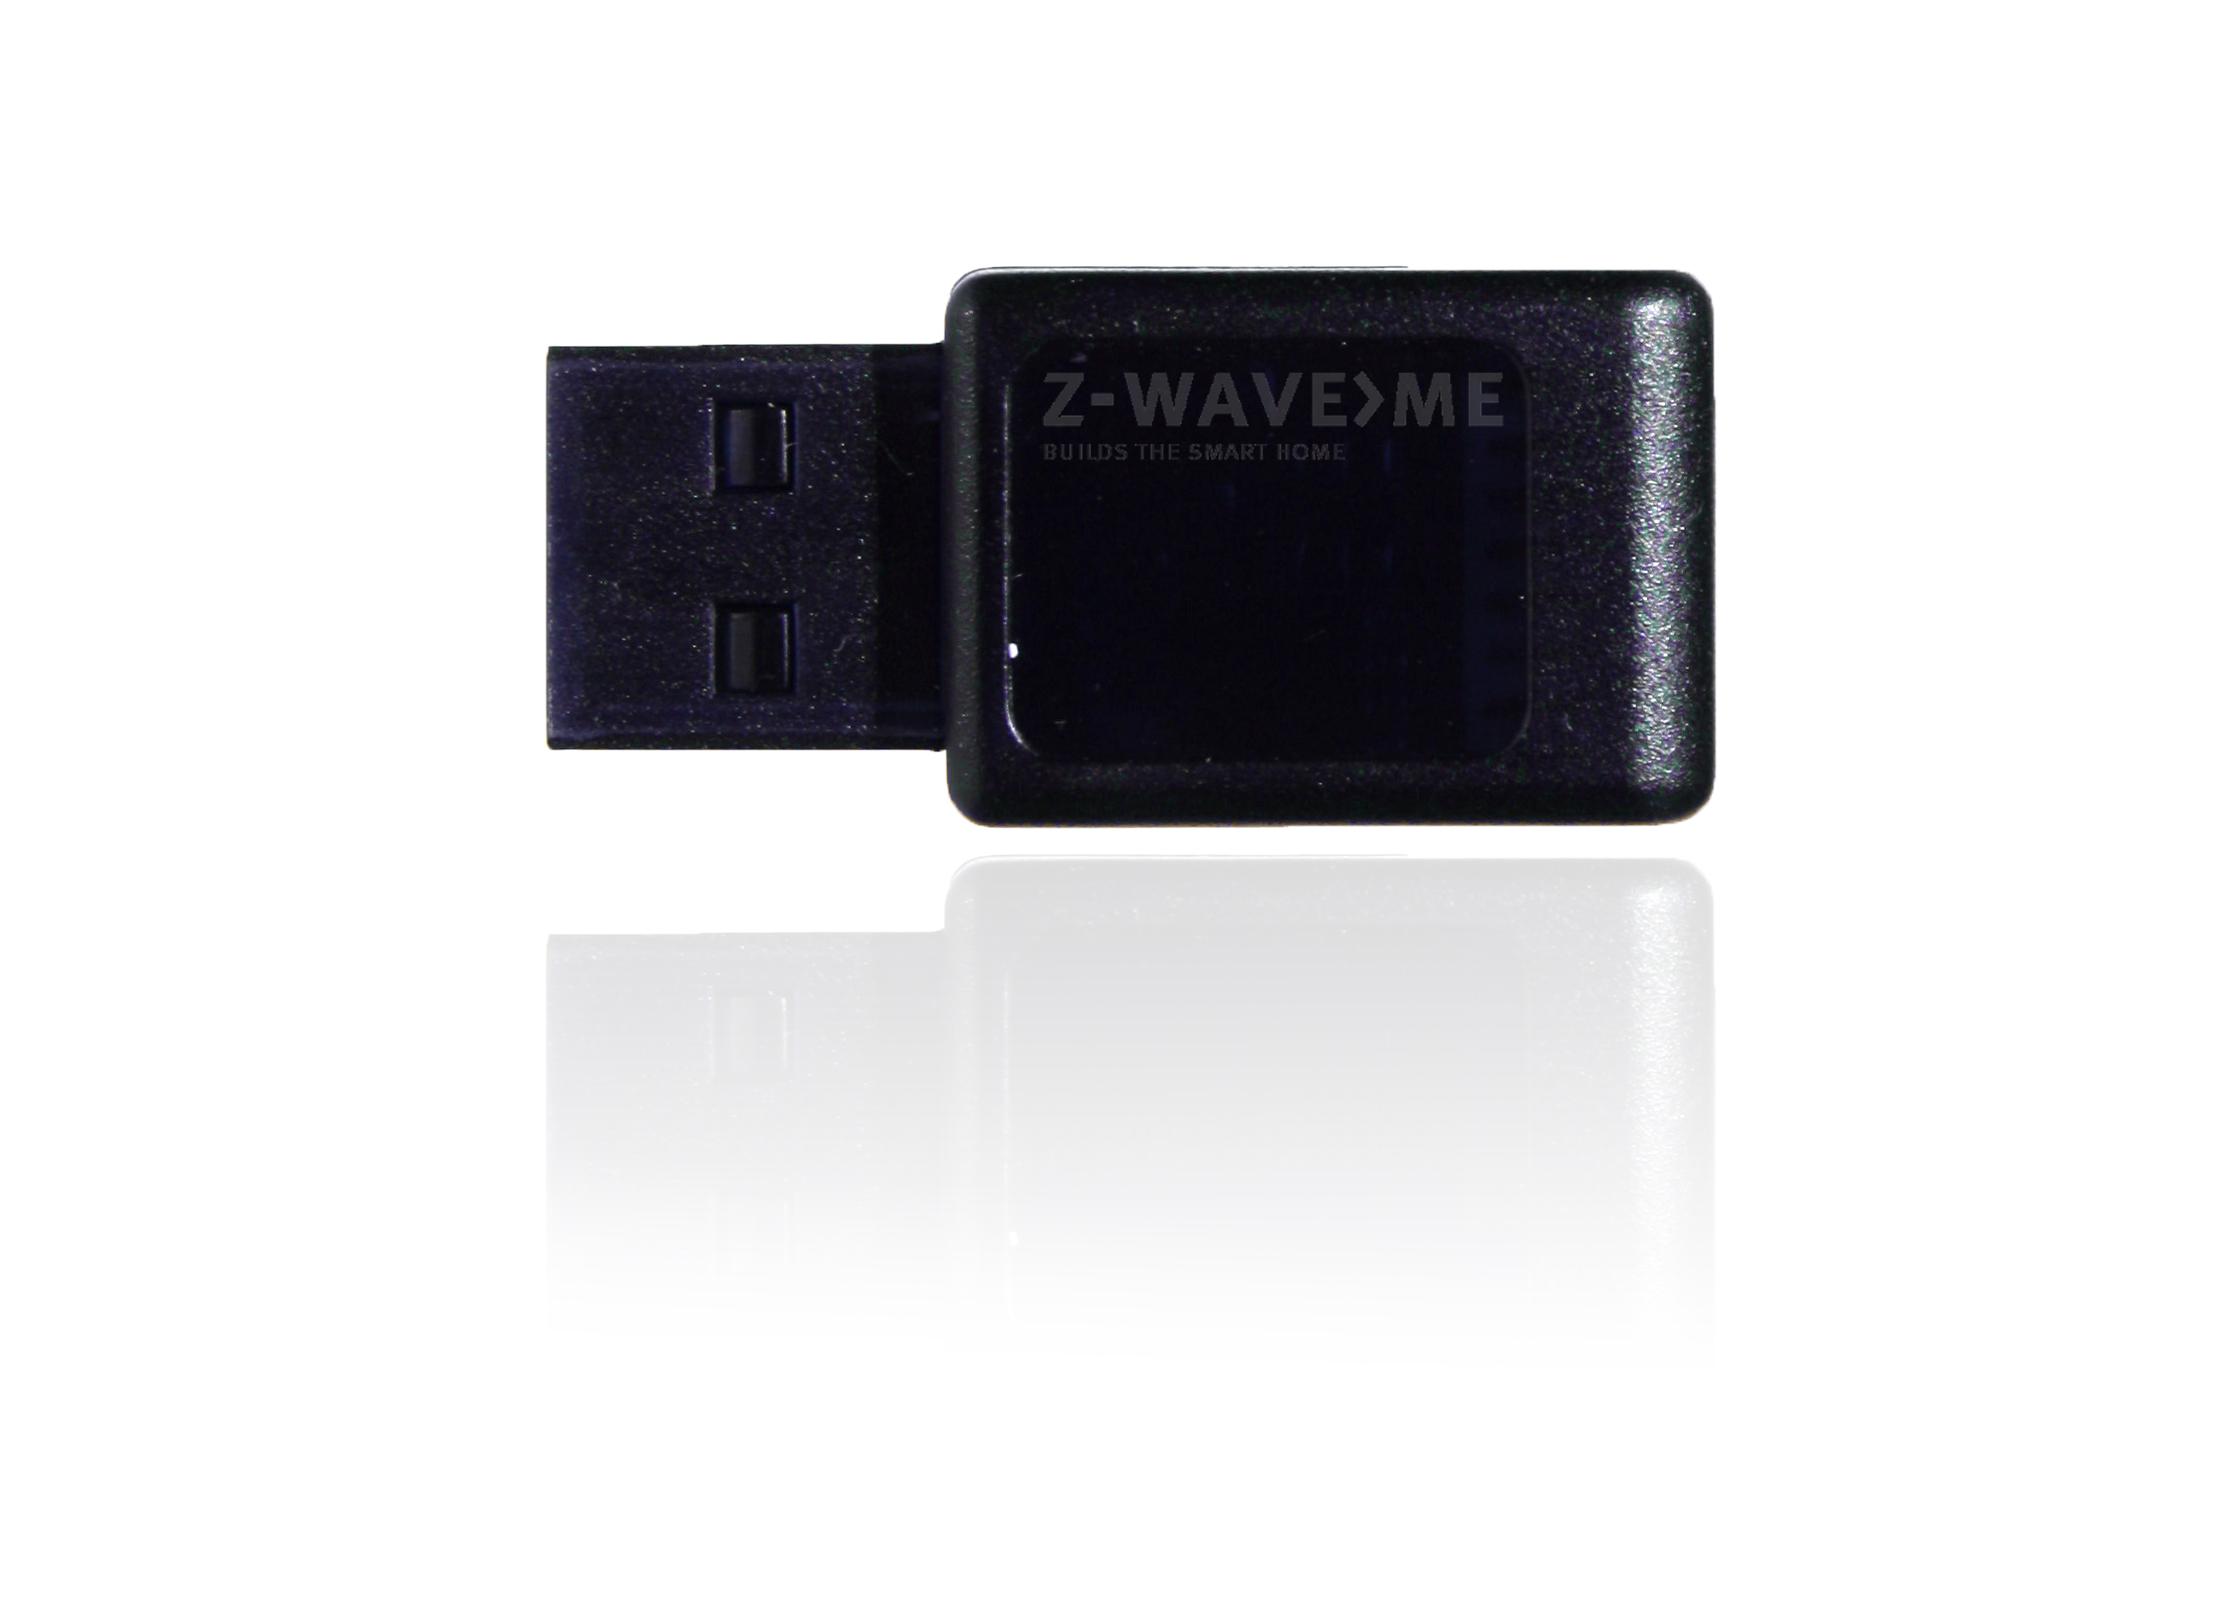 Z Wave Me Uzb Smart Home Stick Pc Adapter Usb Dongles